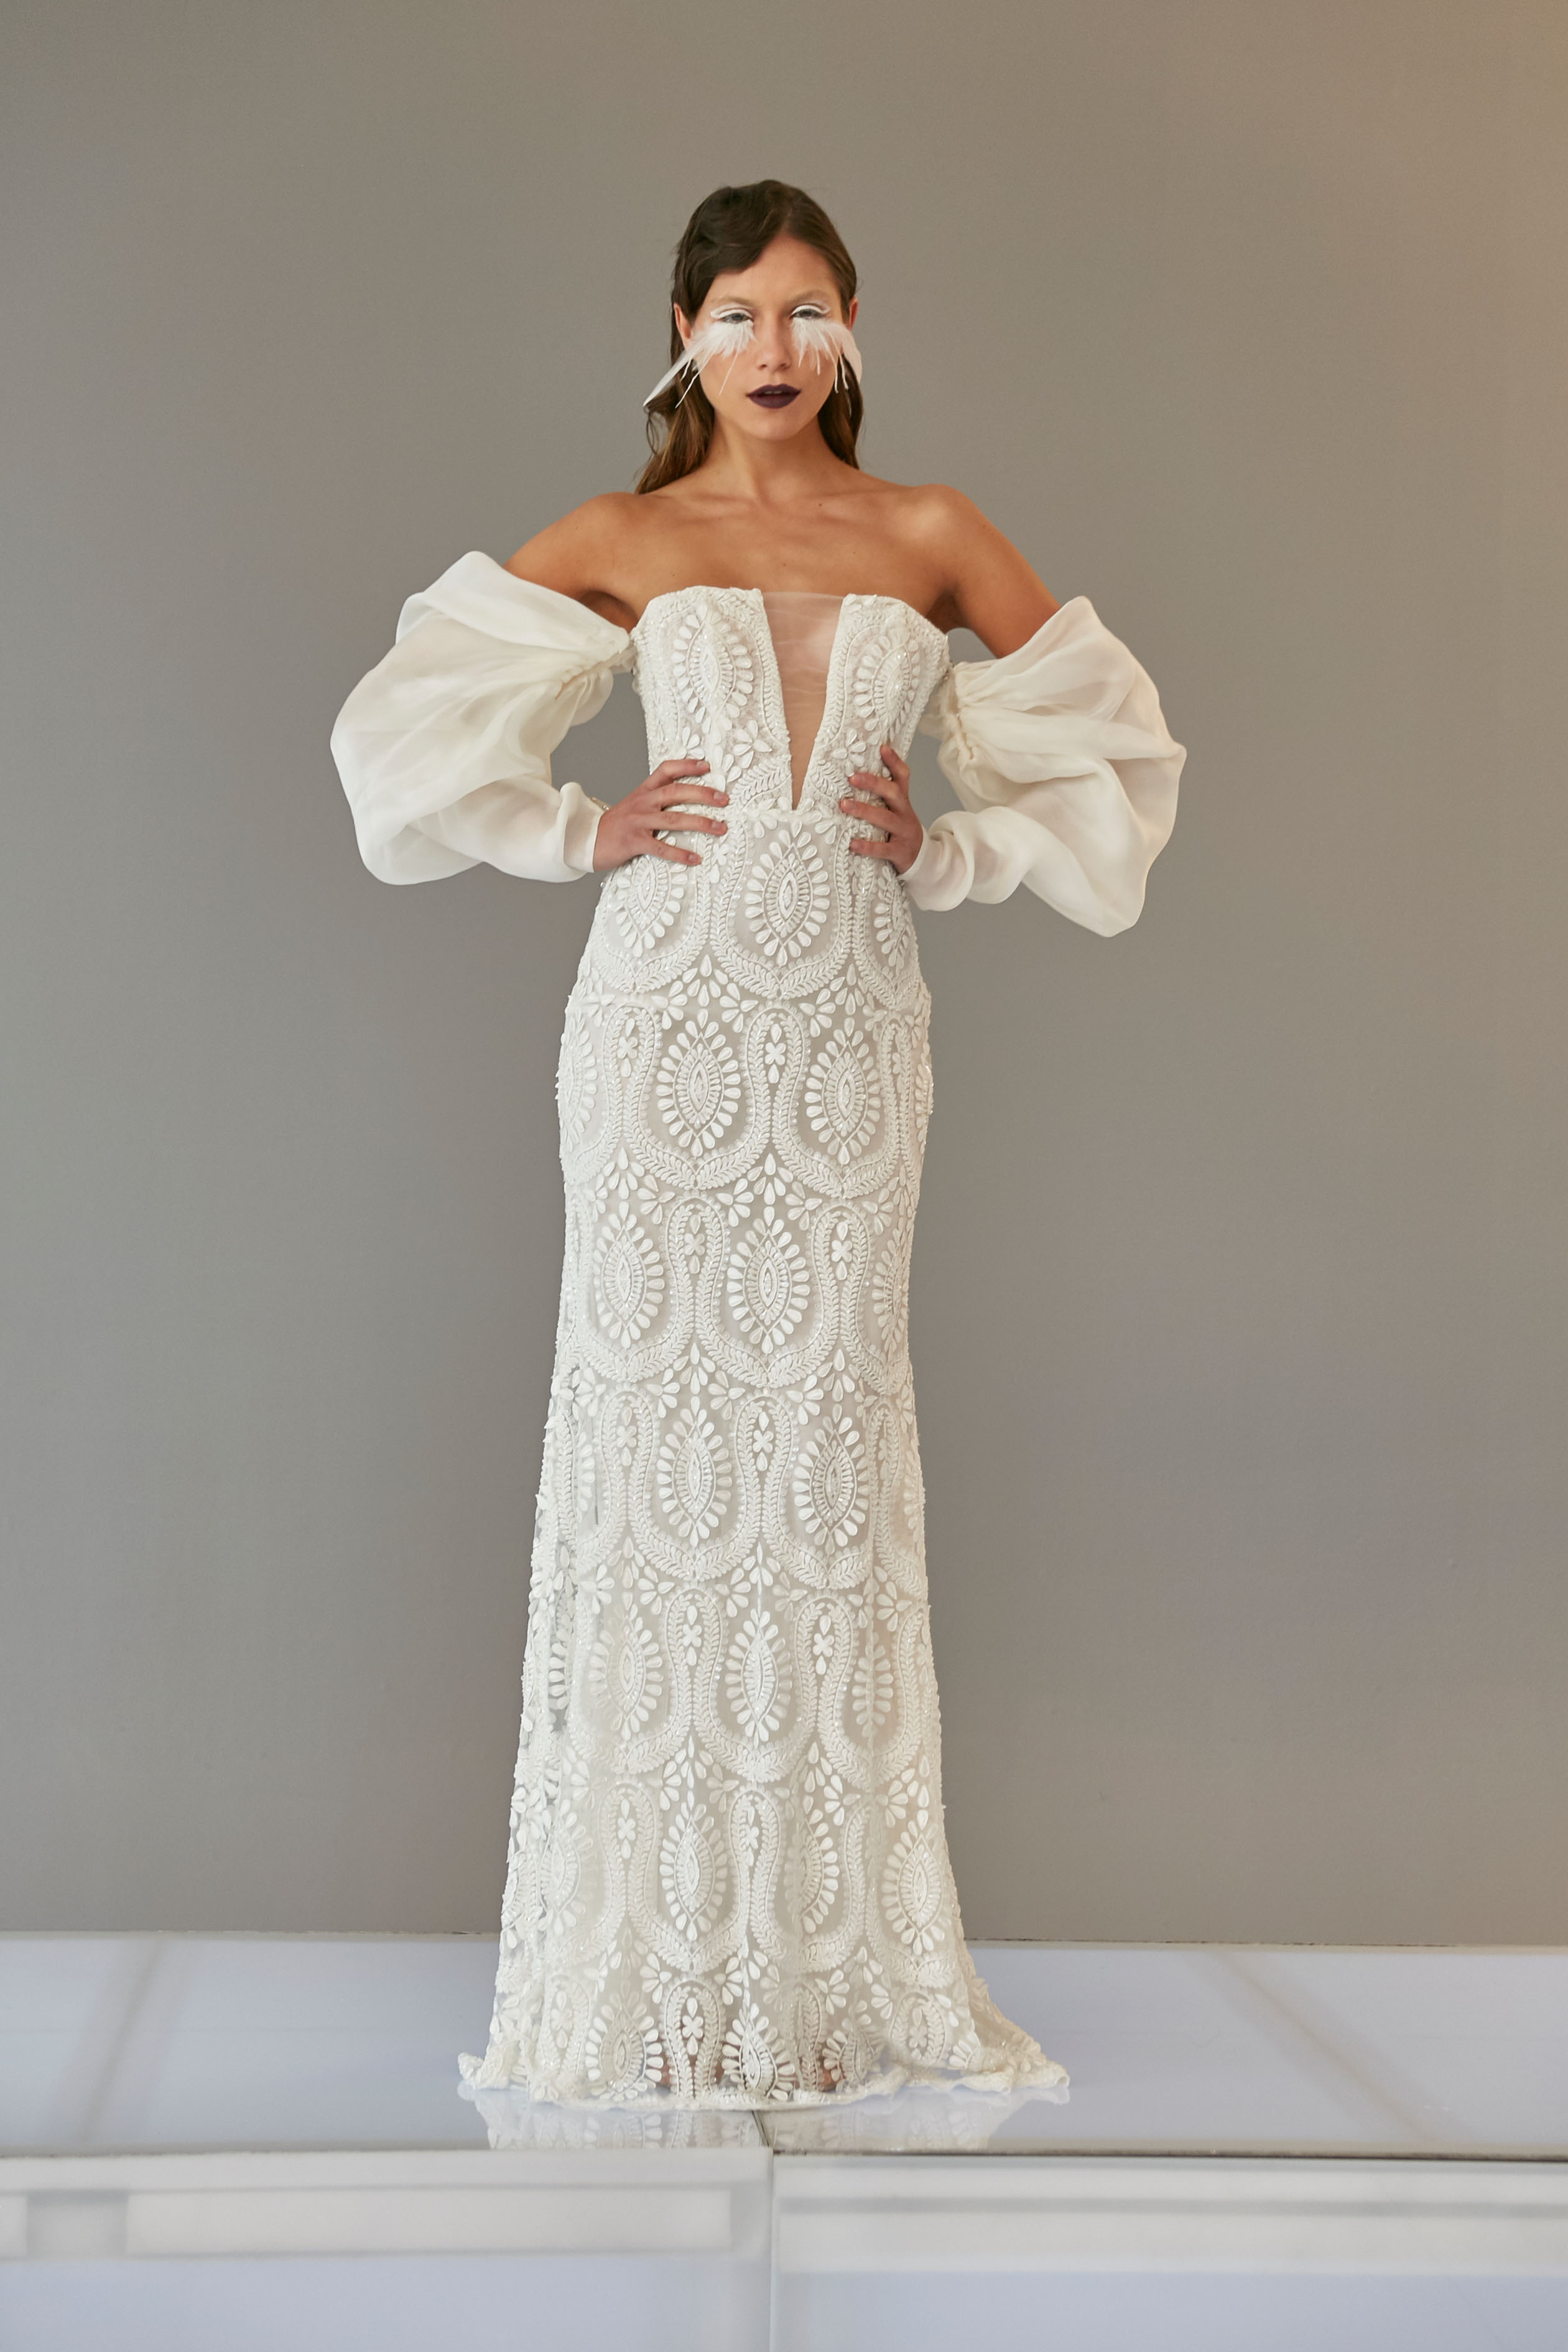 off the shoulder long puffed sleeves illusion deep v-neck embroidered lace sheath wedding dress Francesca Miranda Spring 2020